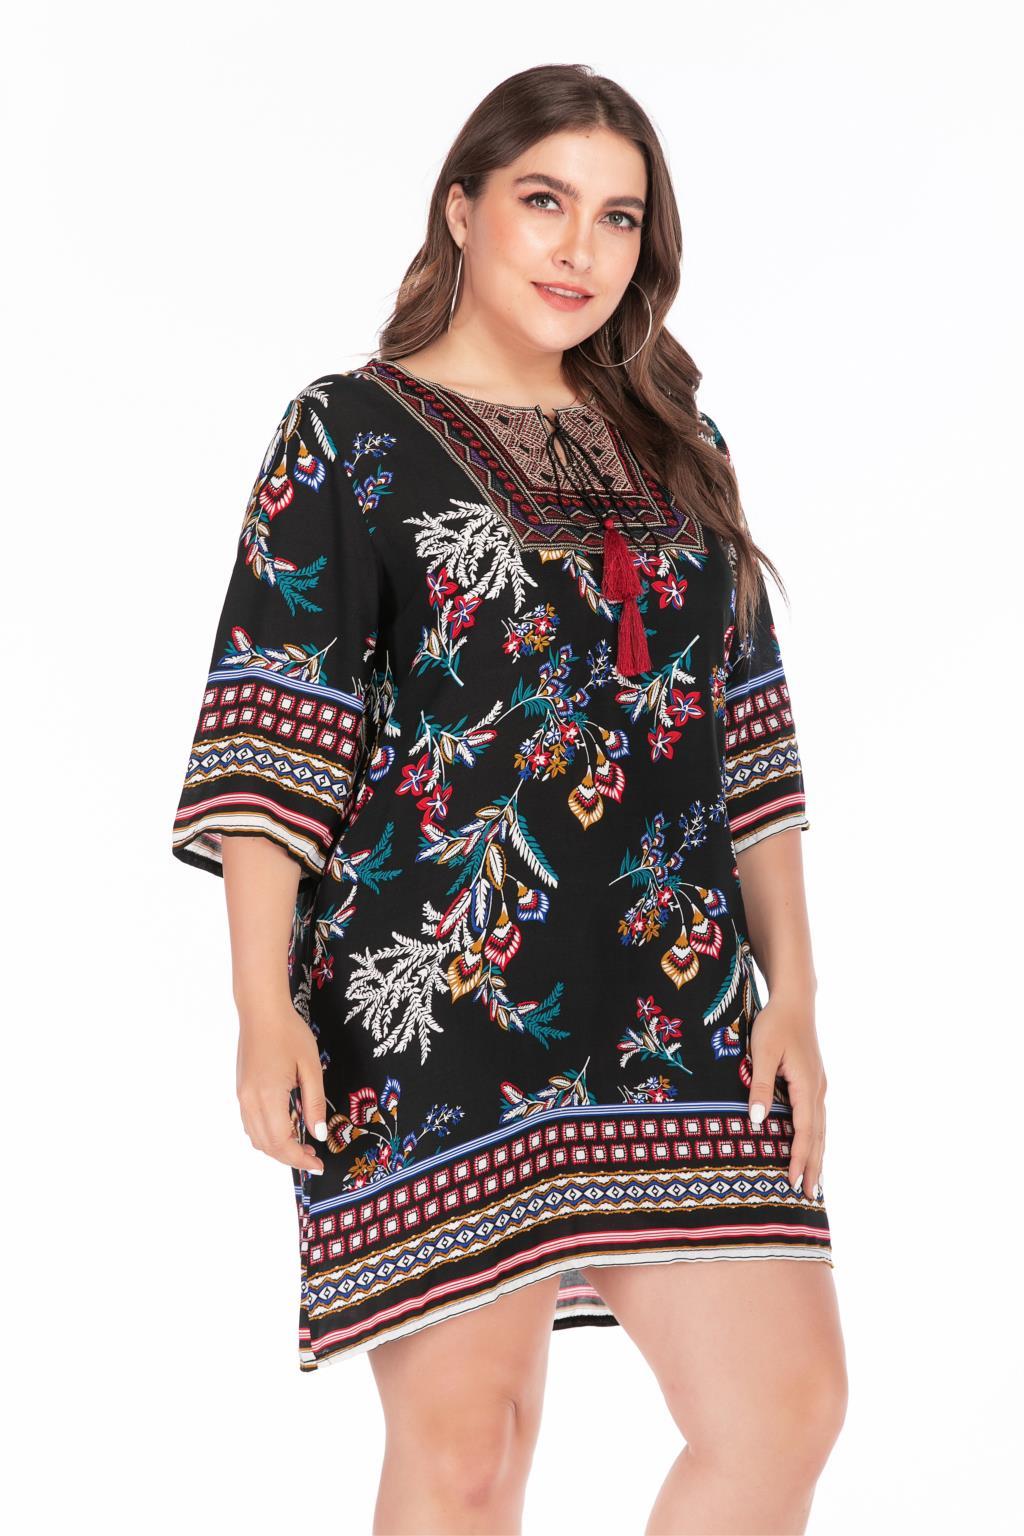 Plus Size Summer Dress 2019 Women Embroidery O Neck Floral Print Short Mini Dress Casual Loose Ladies Tunic Beach Dresses